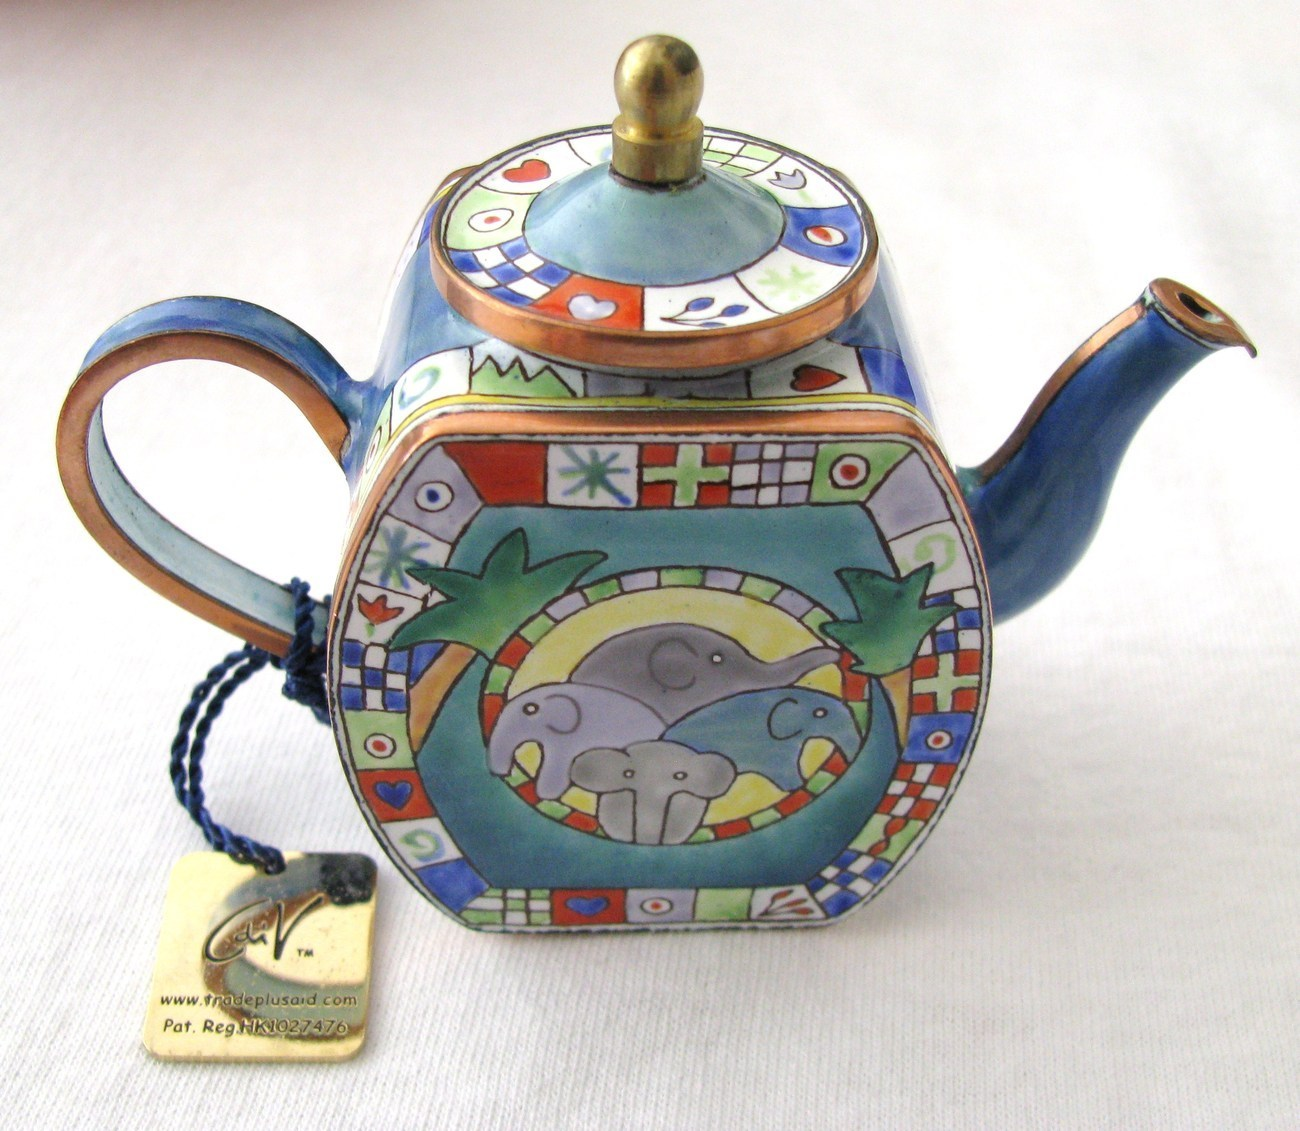 charlotte di vita miniature enamel teapot watering hole tea pots sets. Black Bedroom Furniture Sets. Home Design Ideas